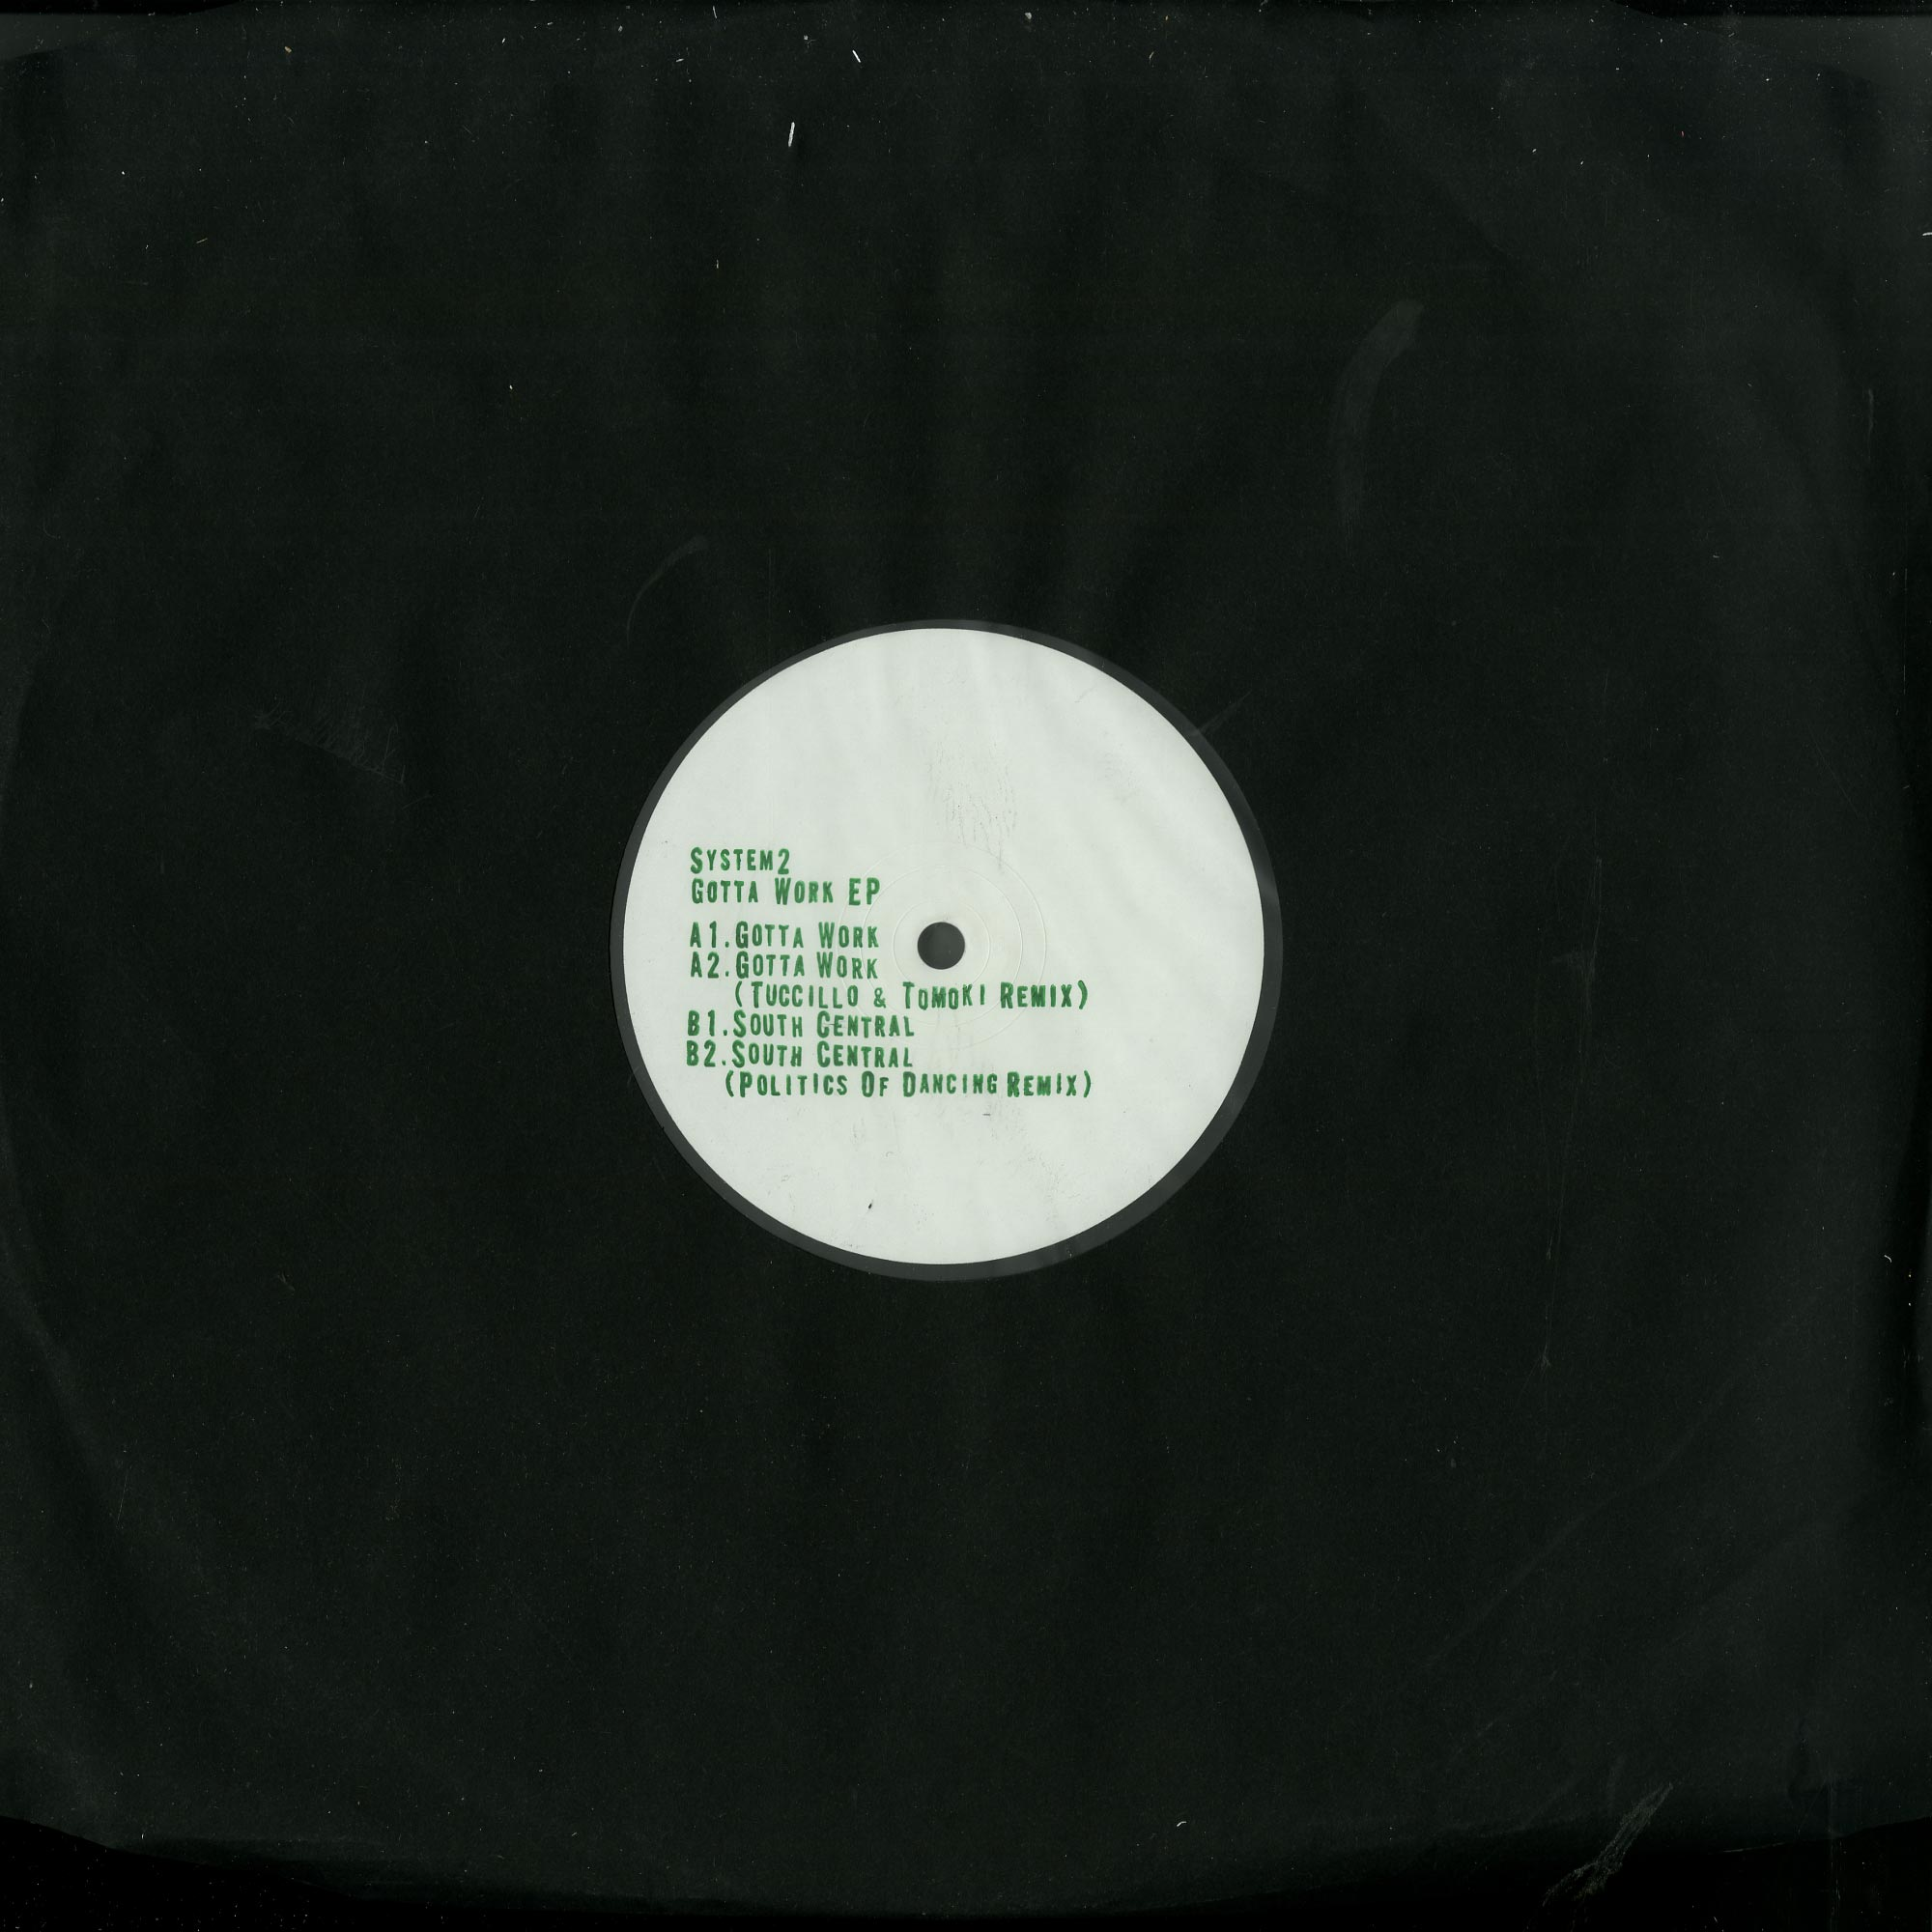 System2 - GOTTA WORK EP